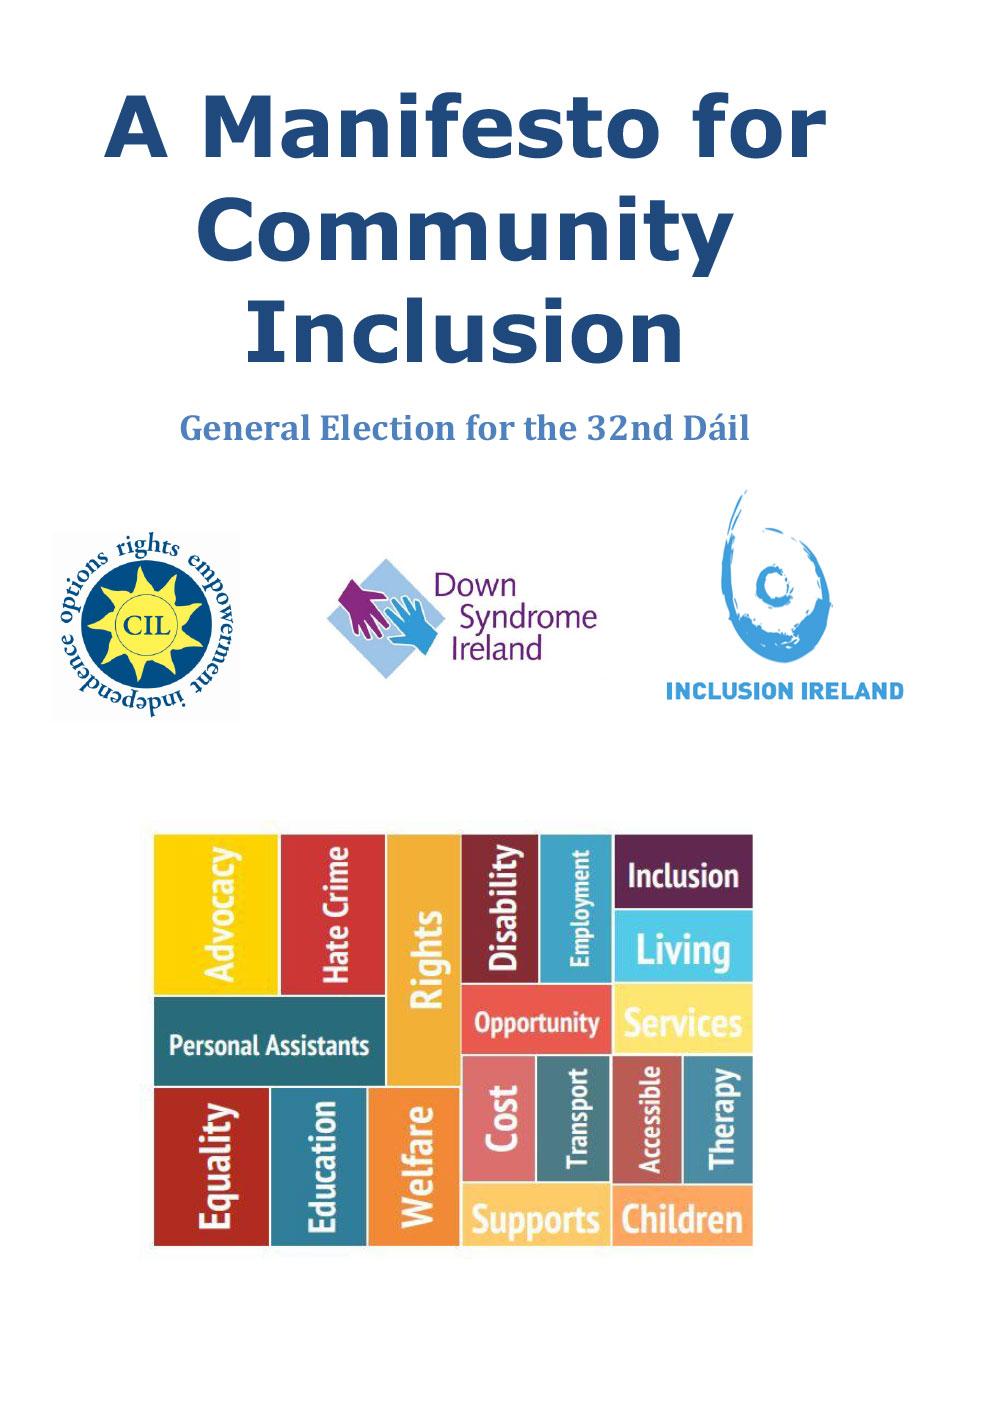 A Manifesto for Community Inclusion